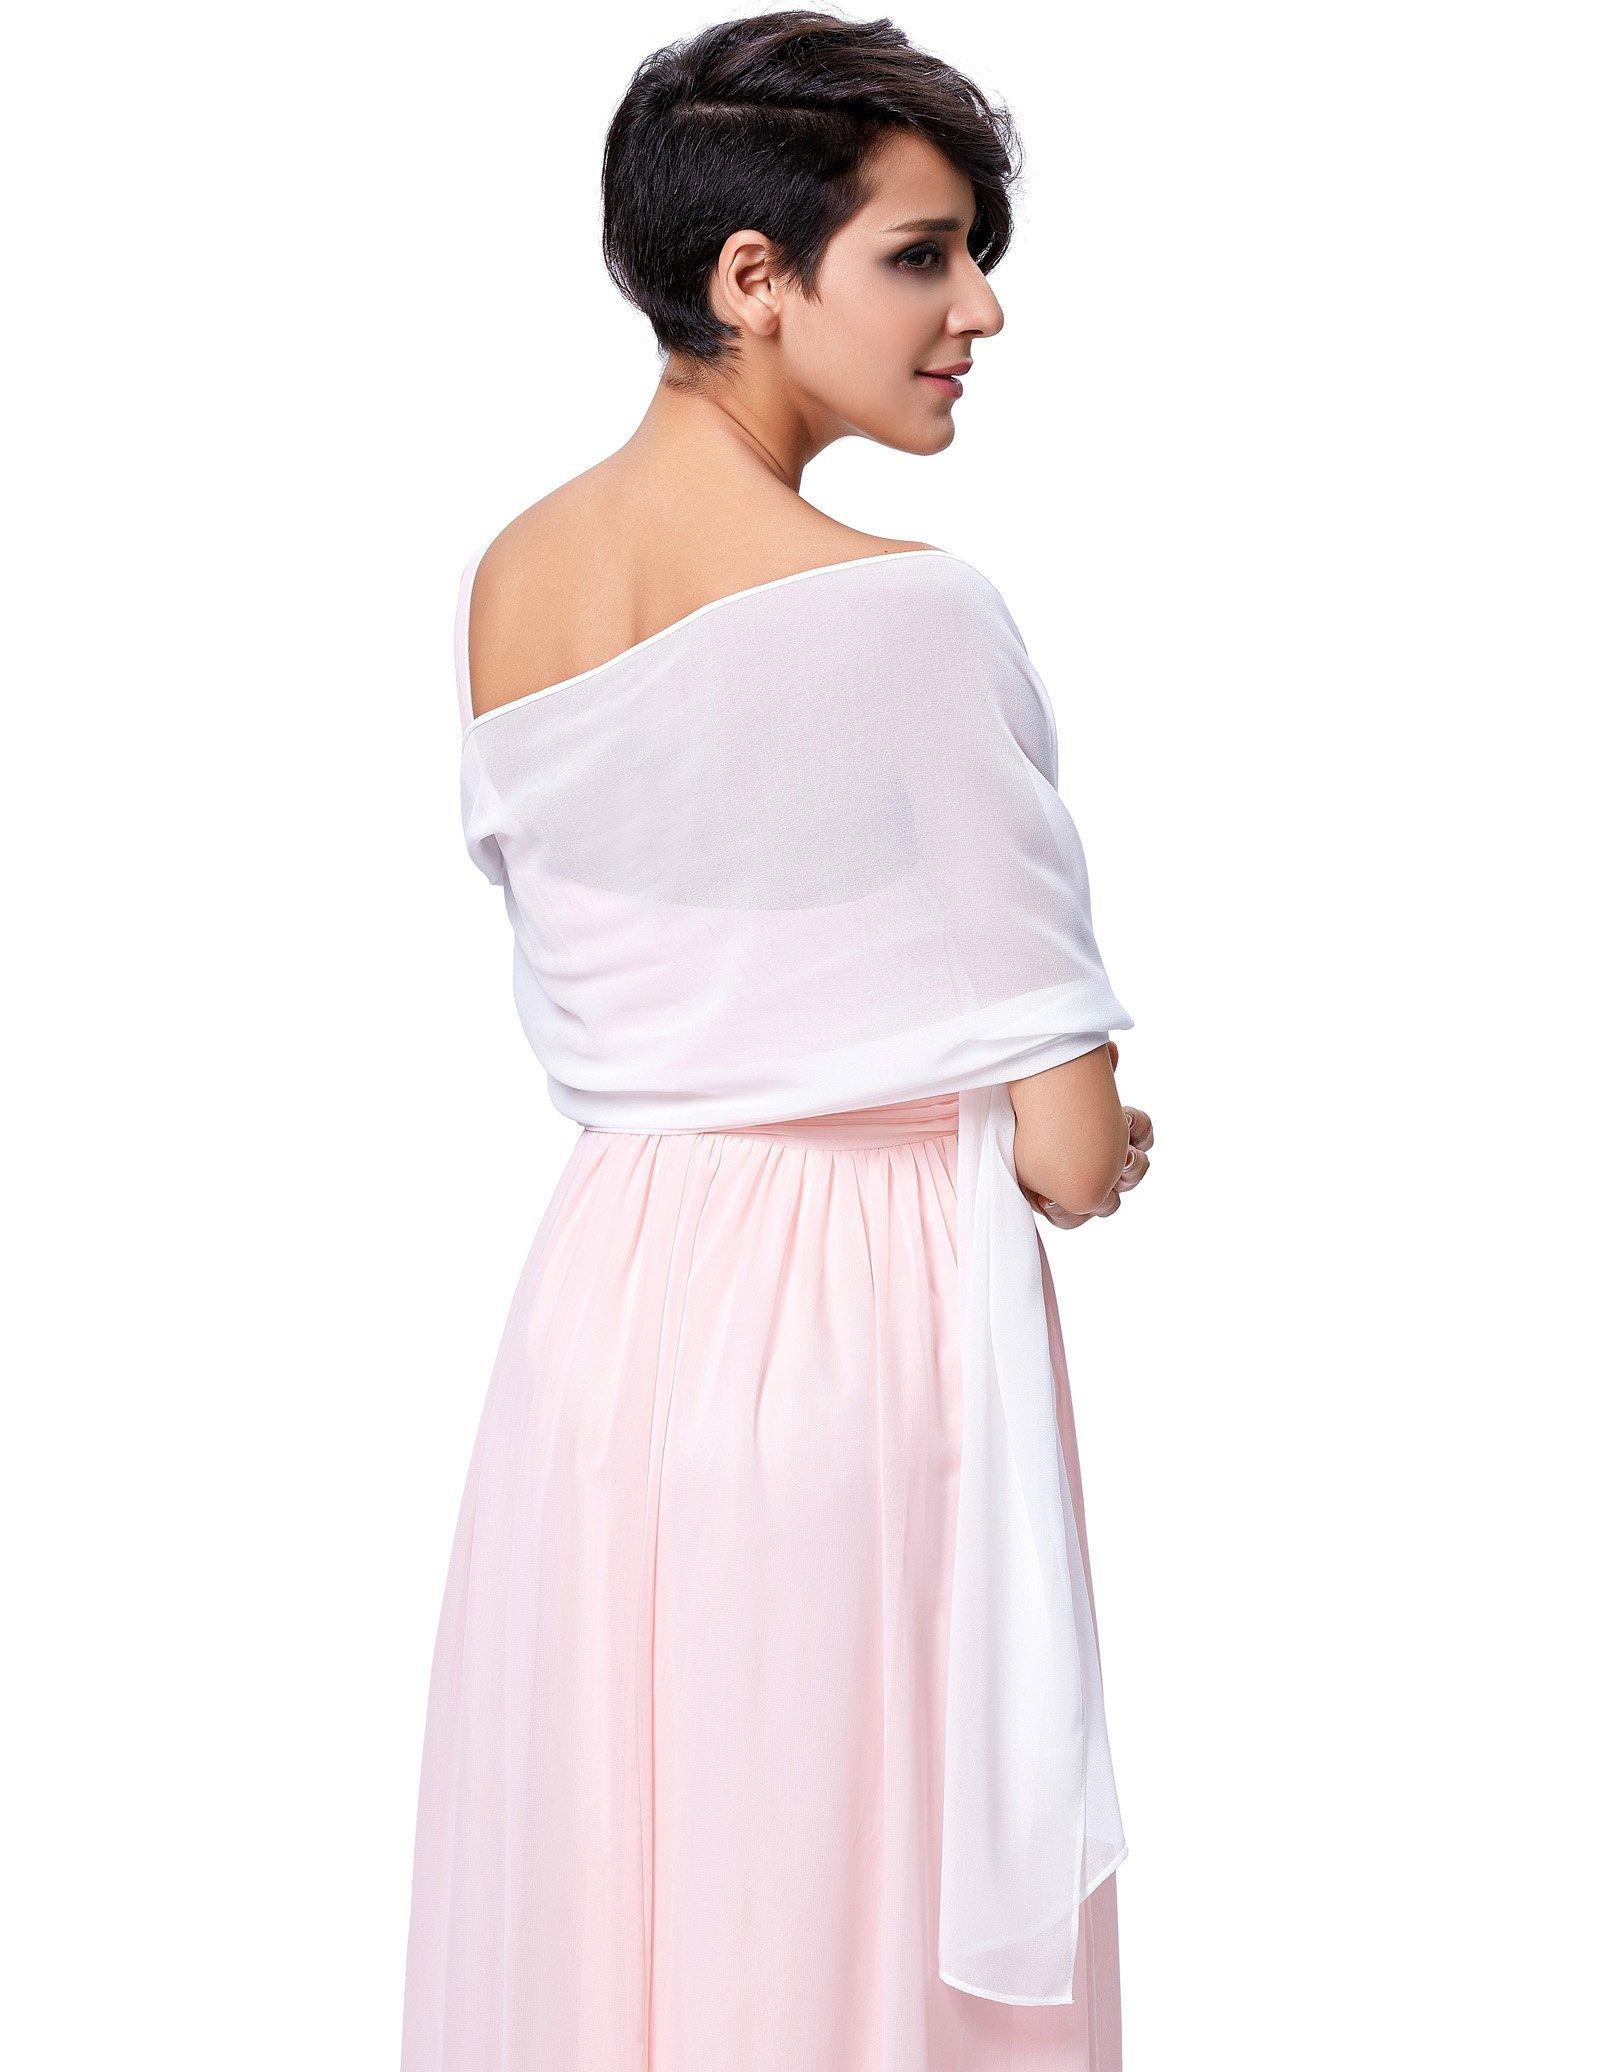 Wedding Soft Chiffon Evening Party Shawls Scarves for Women White KK229 by Kate Kasin (Image #2)